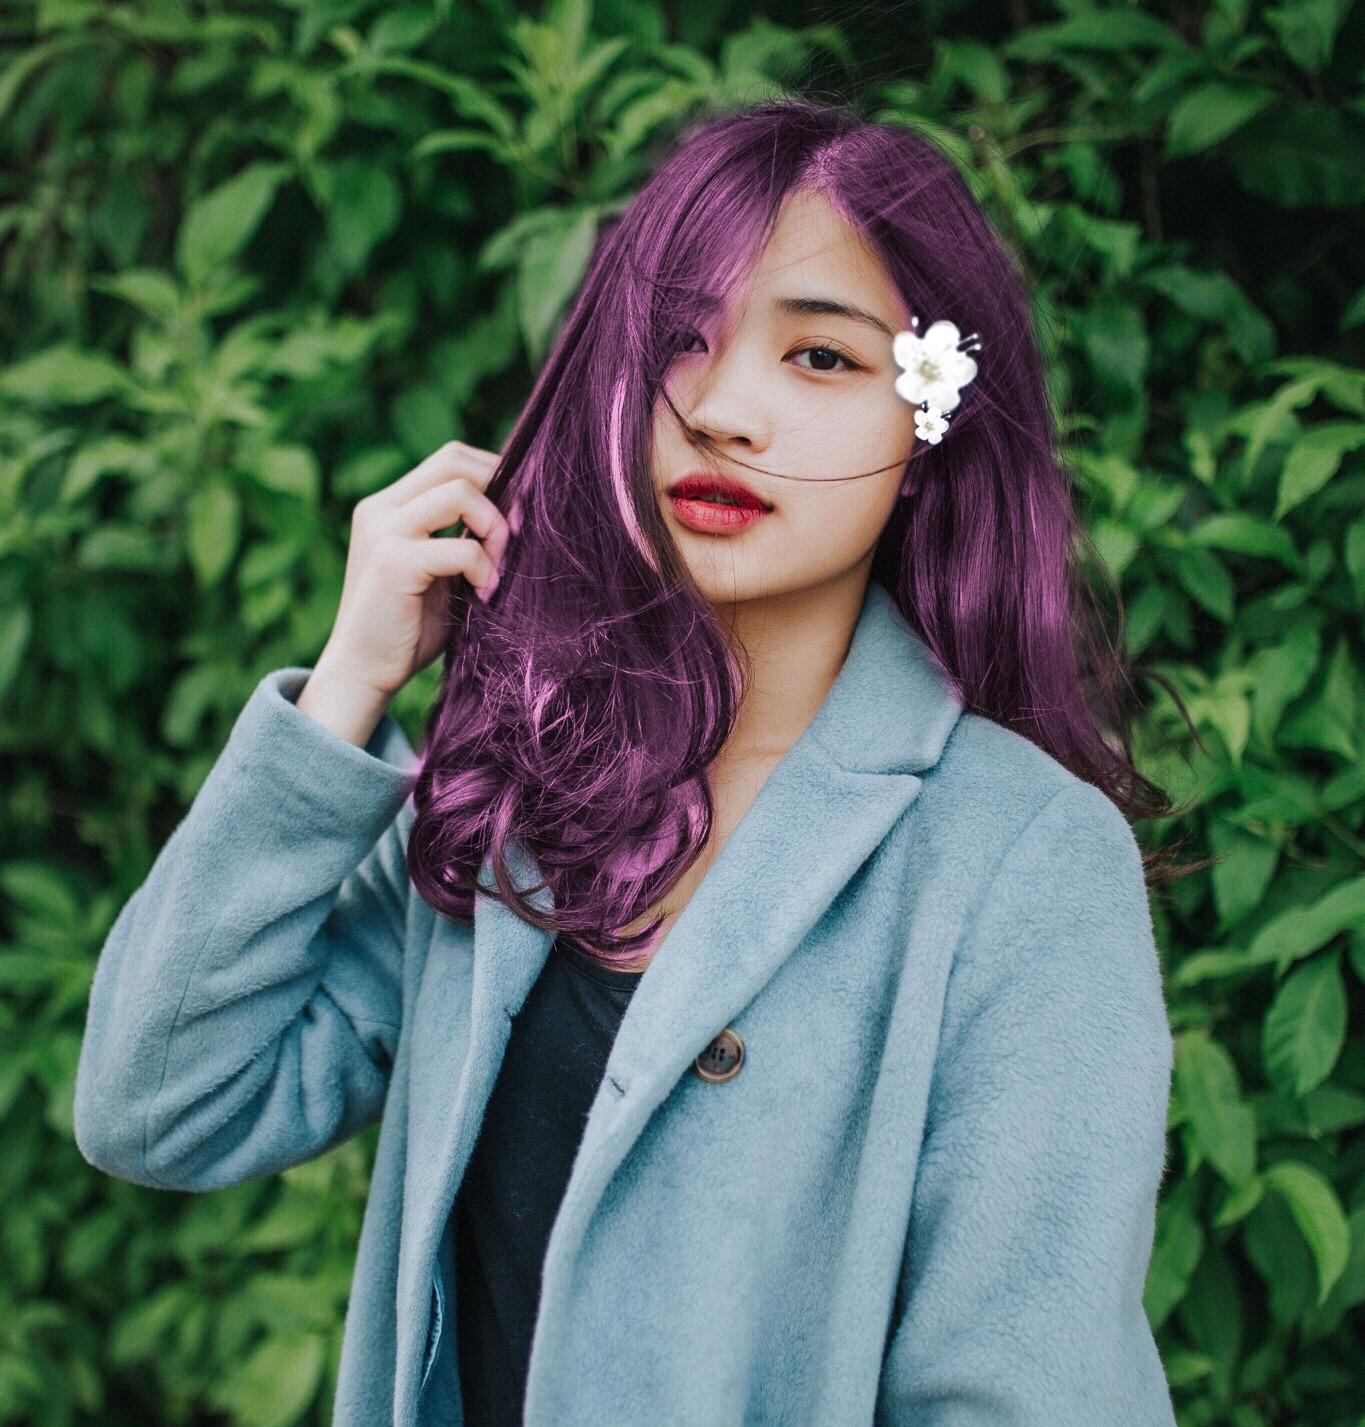 #beautify #beautifypicsart #purplehairdontcare #flower #floral #hellospring